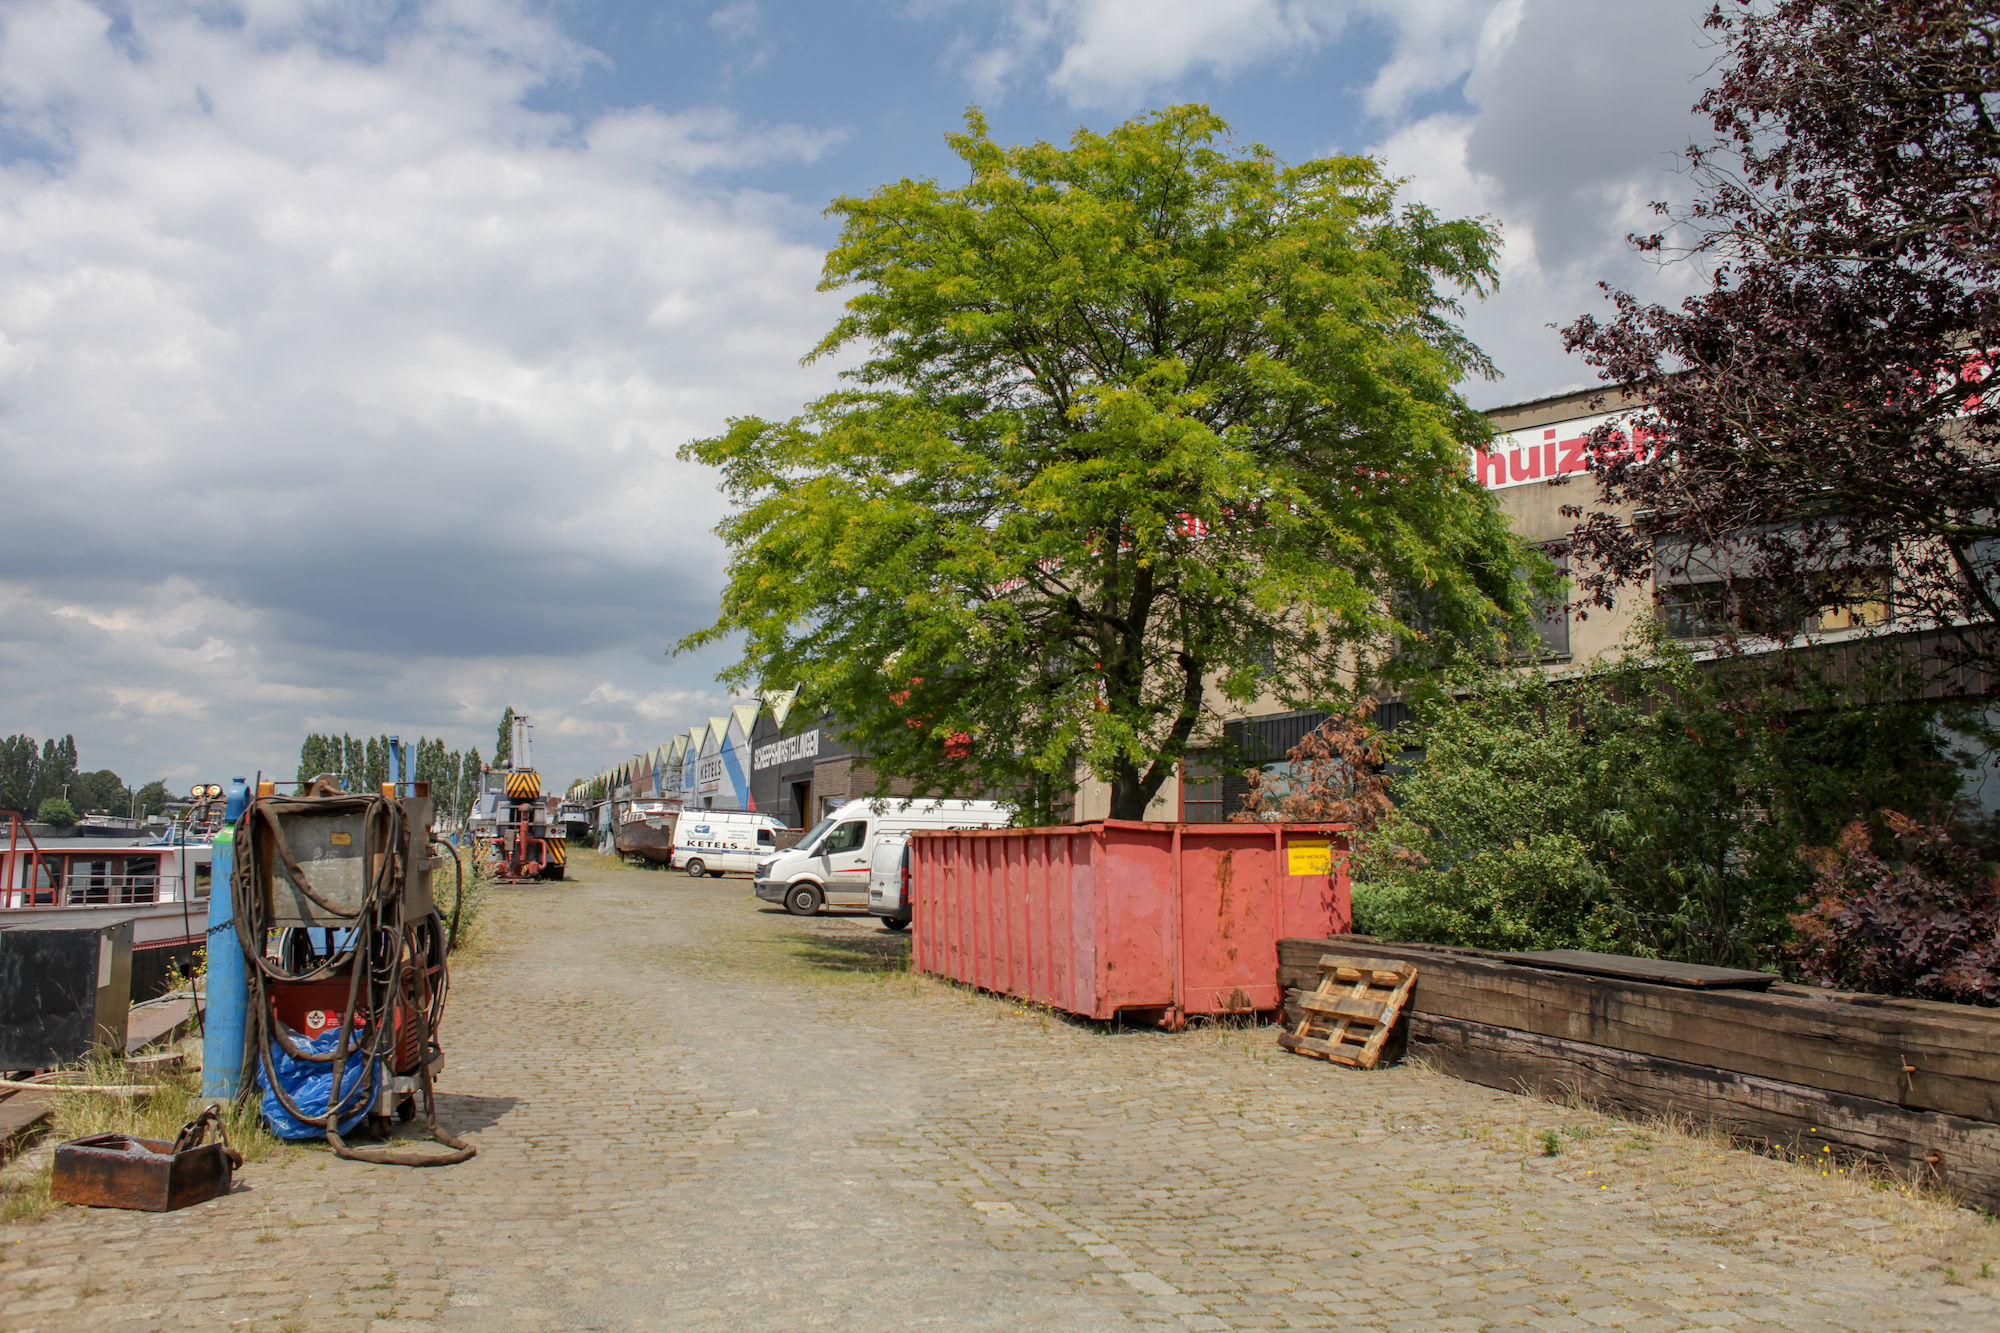 2019-07-02 Muide Meulestede prospectie Wannes_stadsvernieuwing_IMG_0401-2.jpg